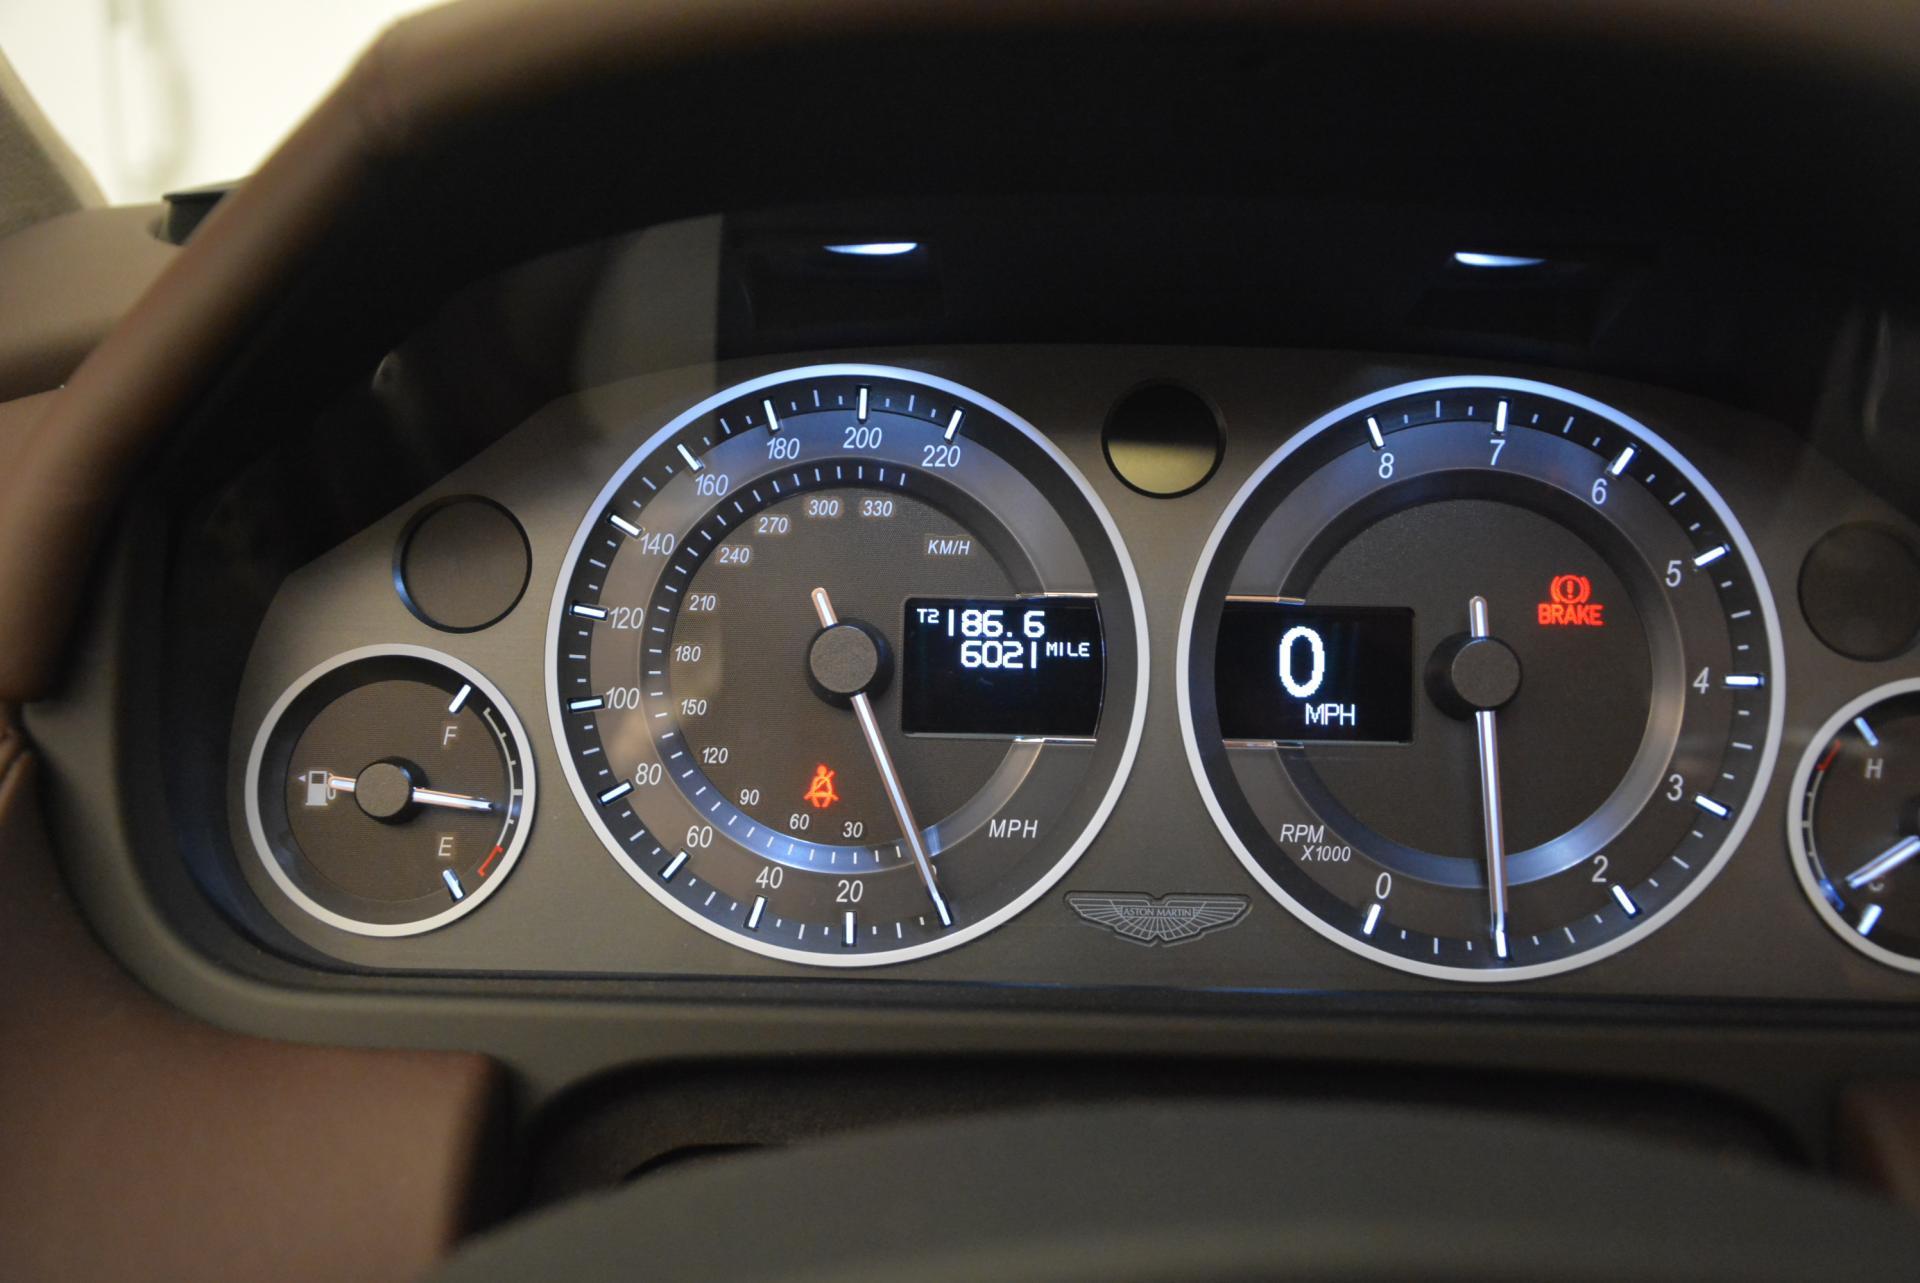 Used 2010 Aston Martin DBS Volante For Sale In Greenwich, CT 87_p34